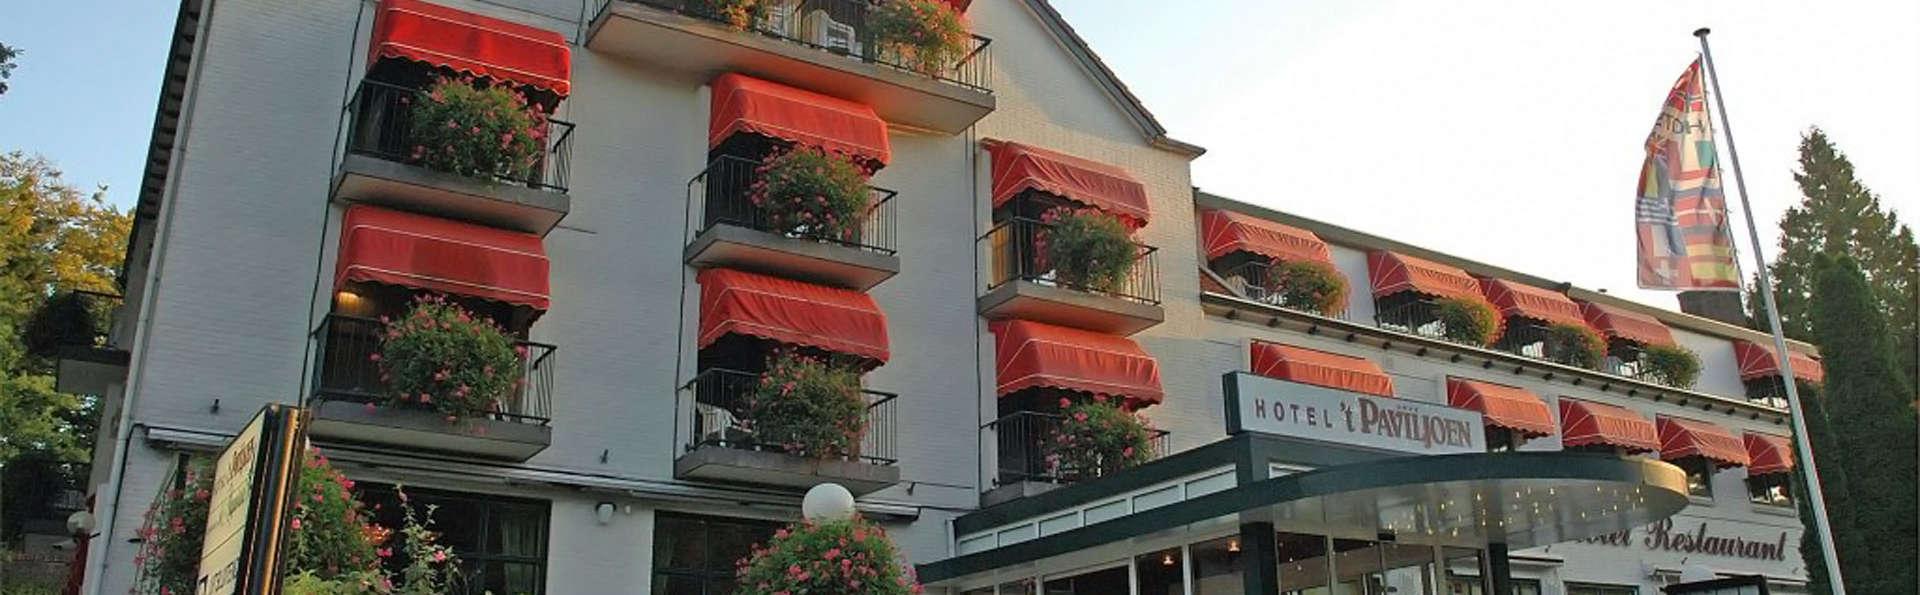 Hotel 't Paviljoen - EDIT_front3.jpg